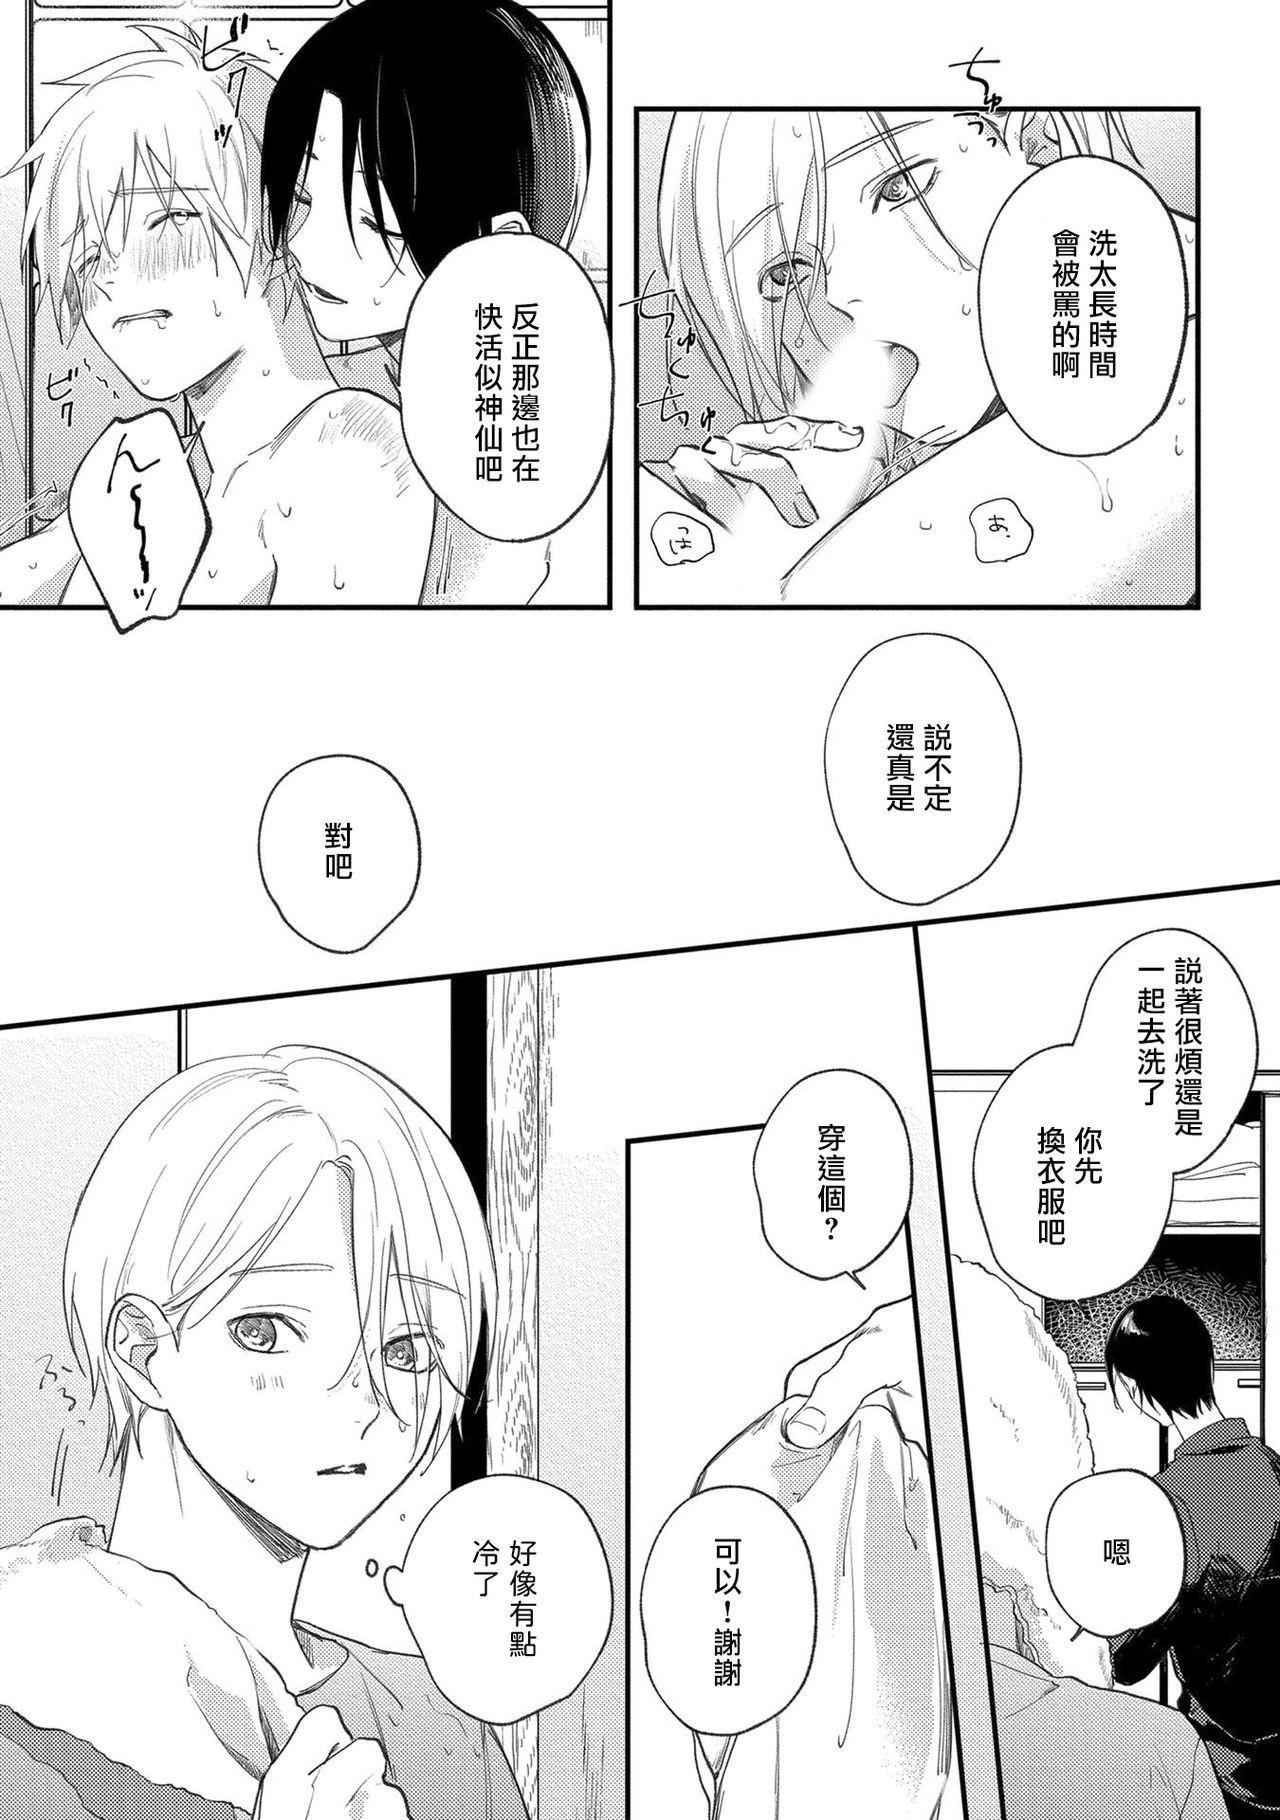 [Utata Hakuto] Houkago Virginity - Virginity afterschool 1-5 完结 [Chinese] [拾荒者汉化组] [Digital] 152